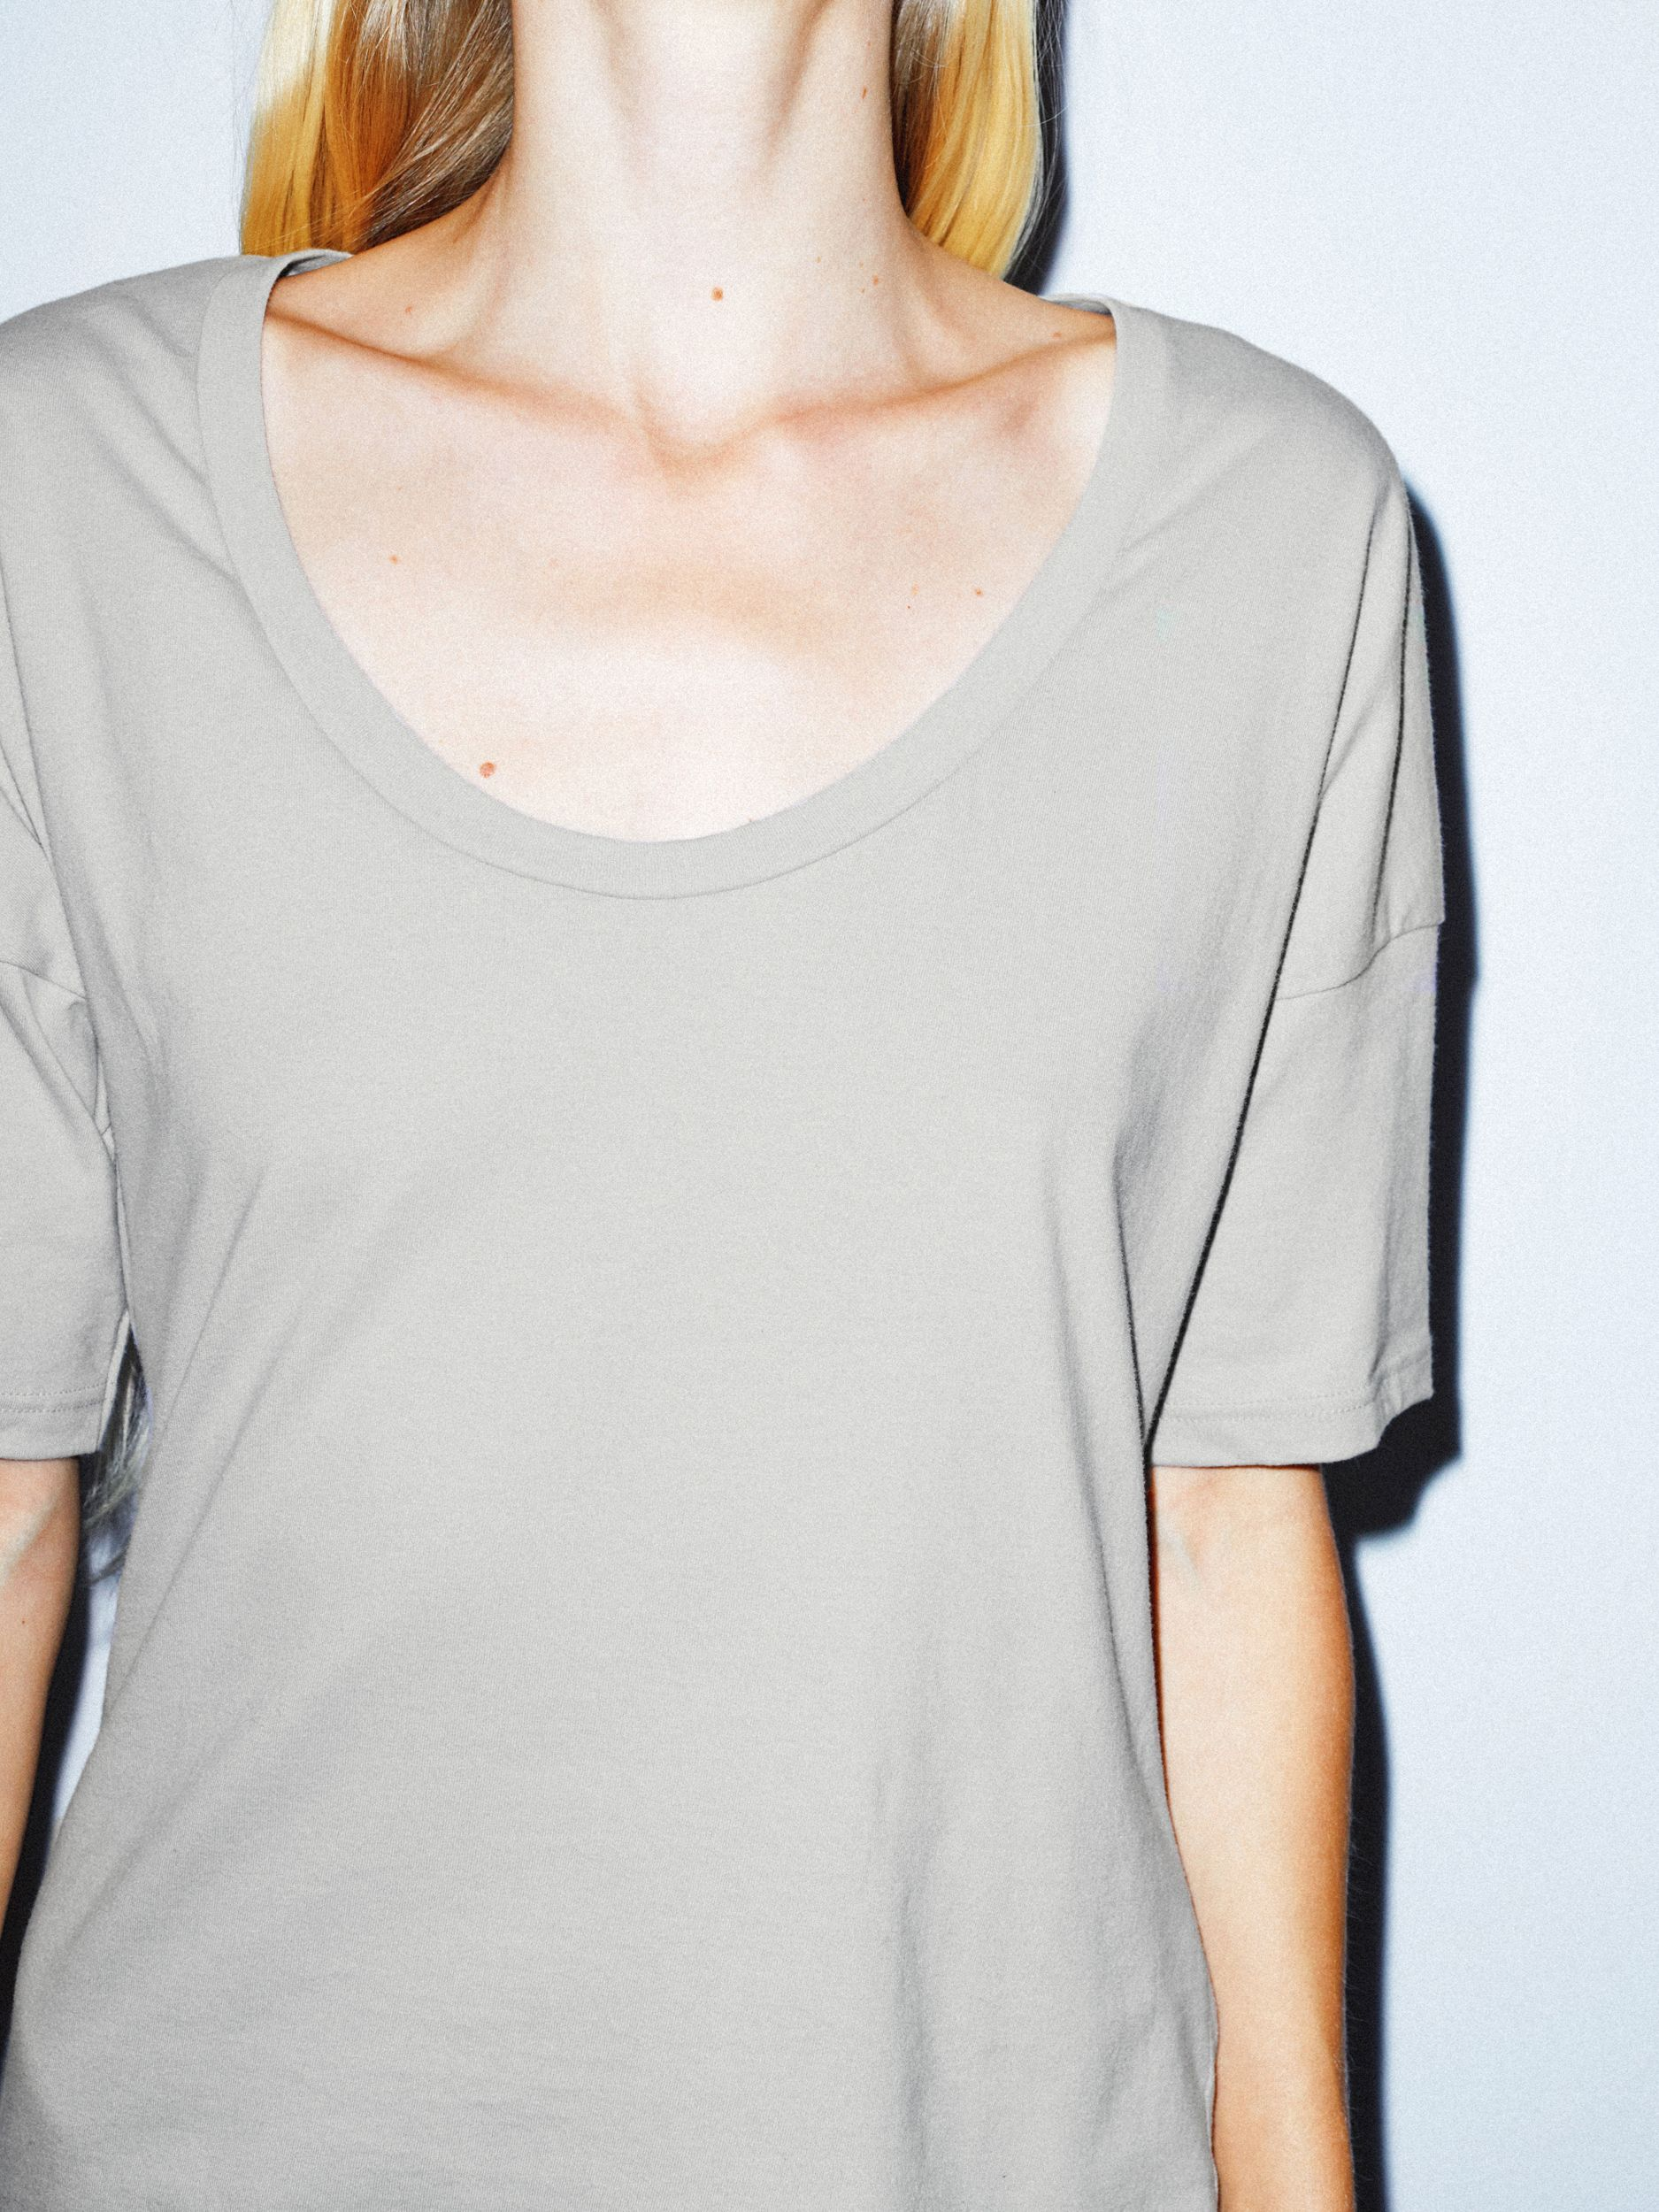 4a4afc59348e1 Power Wash U Neck T-Shirt | American Apparel | ClosetEditAnnie in ...